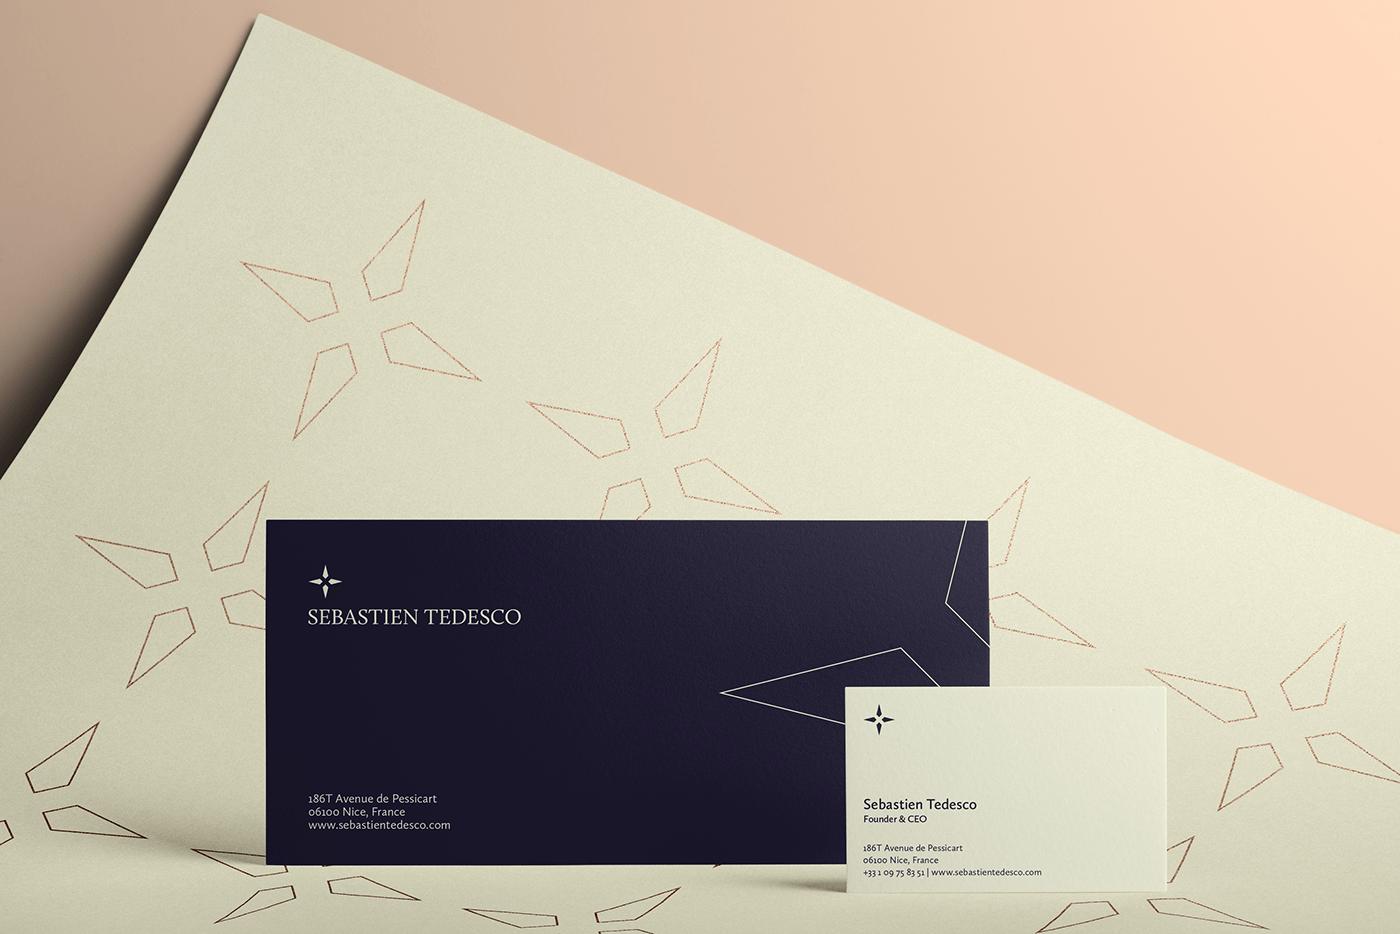 sebastien tedesco business card envelope pattern